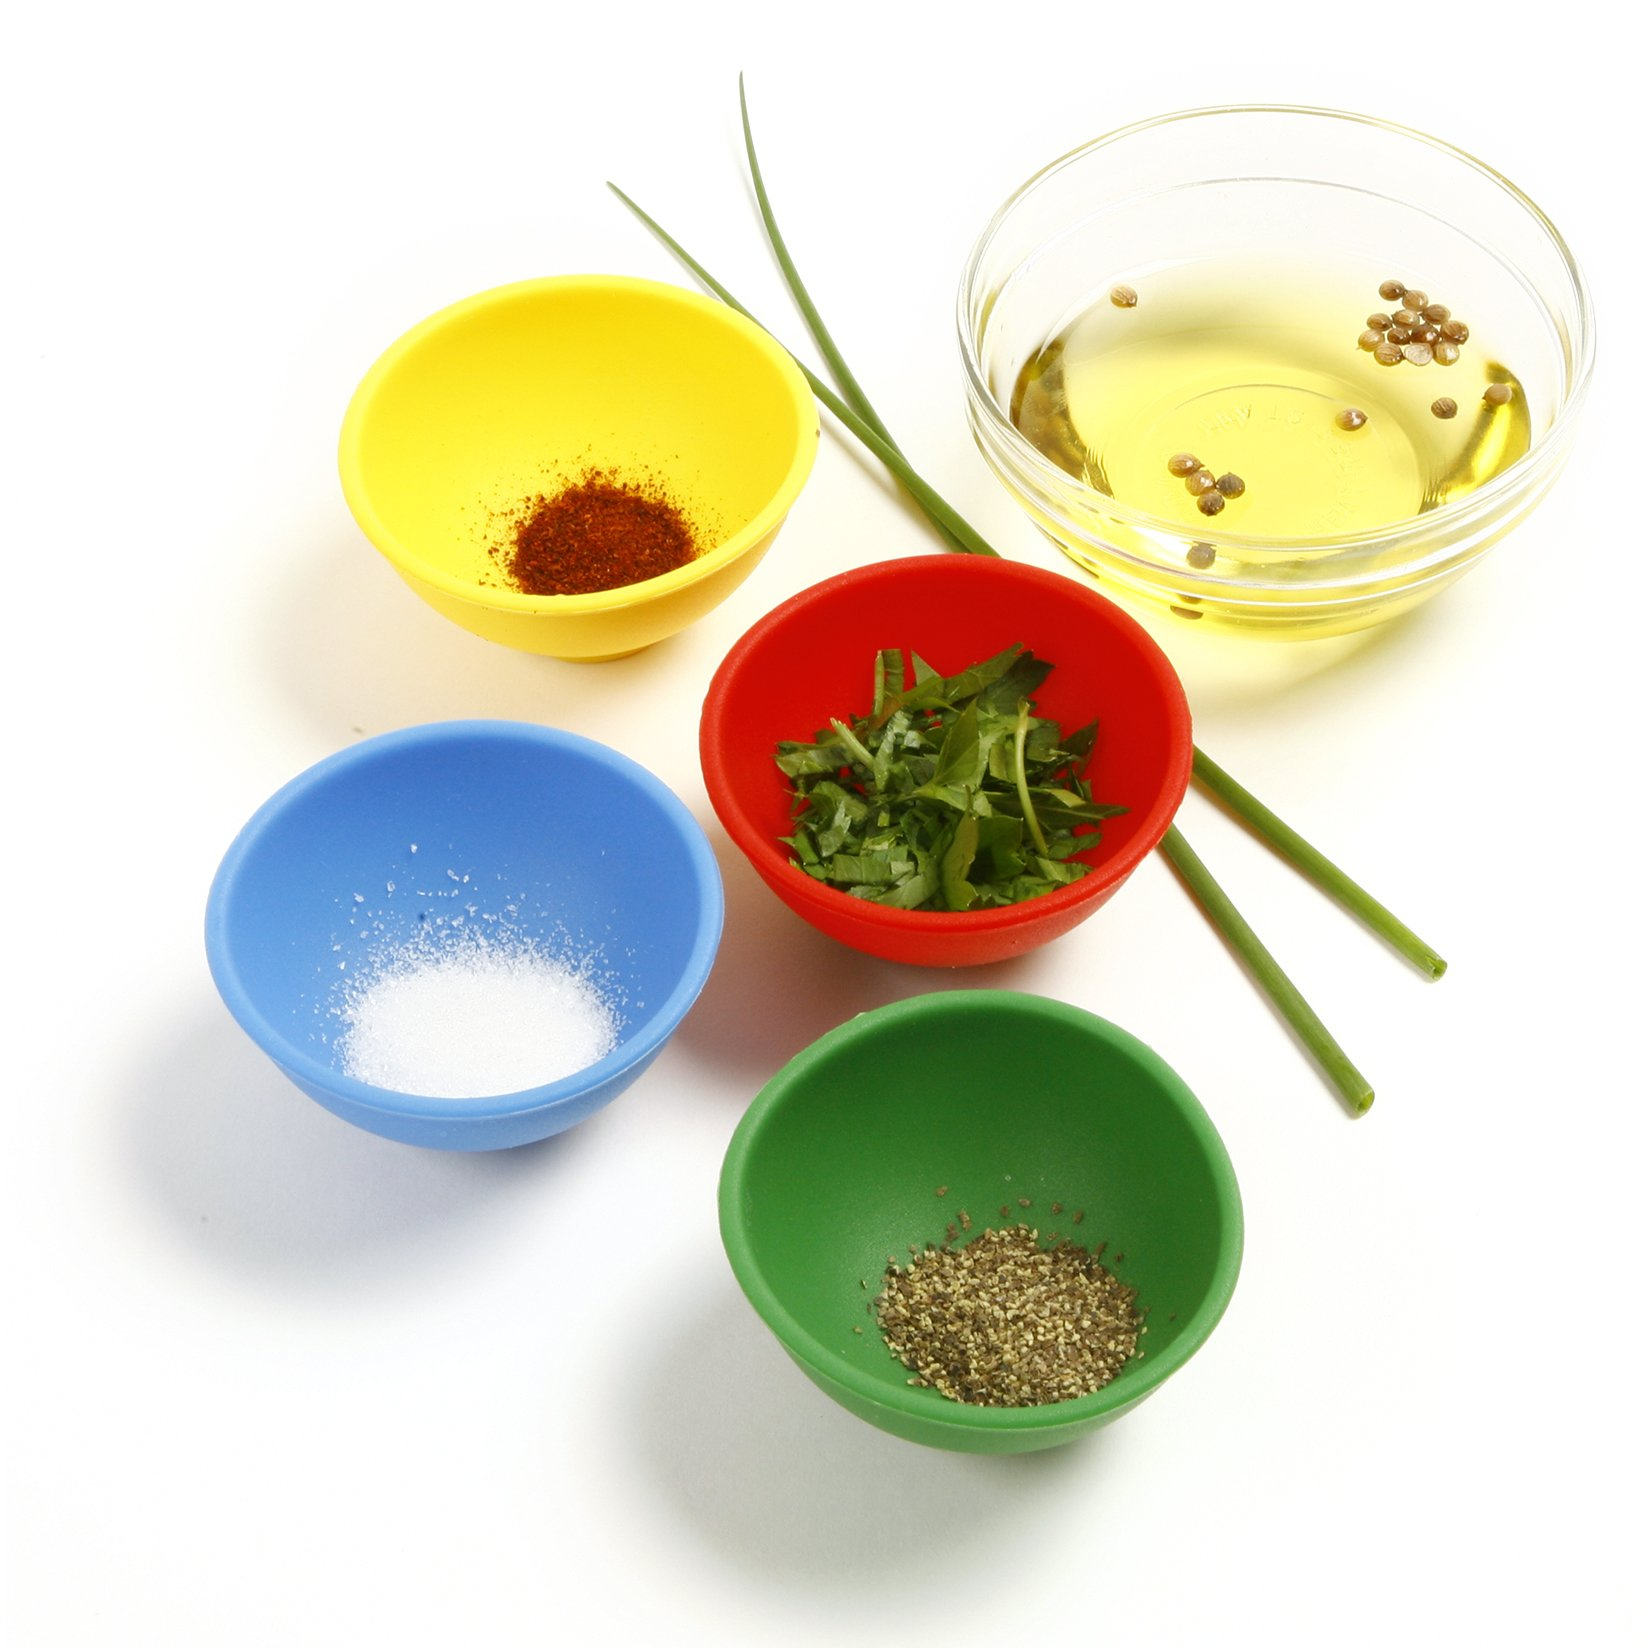 Norpro Silicone Mini Pinch Bowls, Set of 4